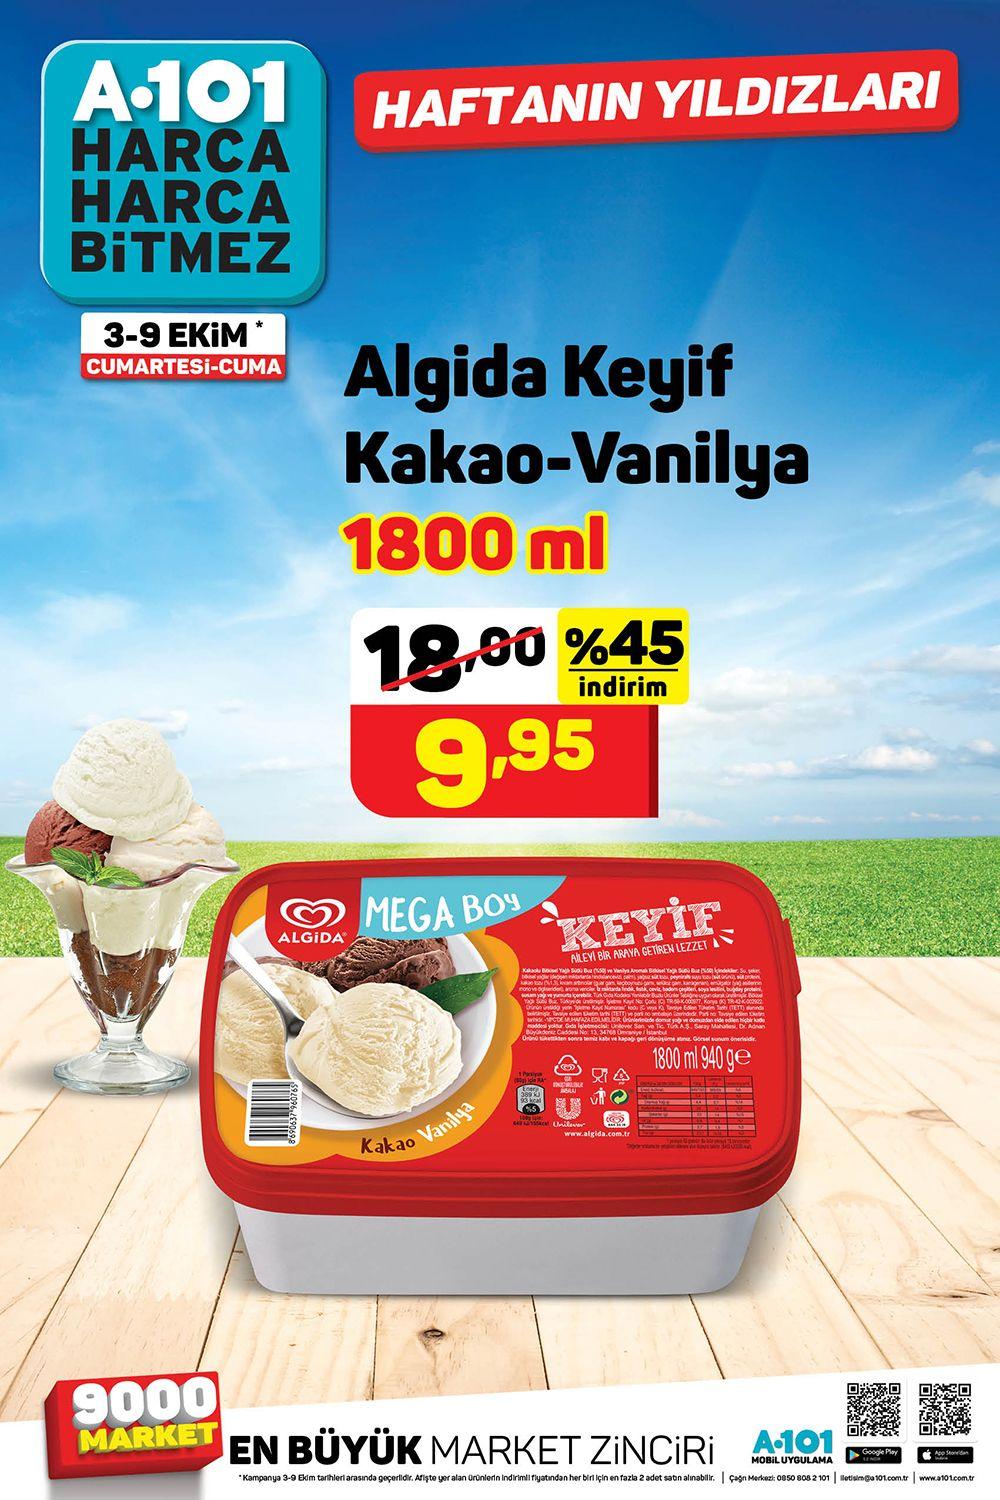 A101-3-9-Ekim-2020-Algida-Keyif-Dondurma-Urunleri